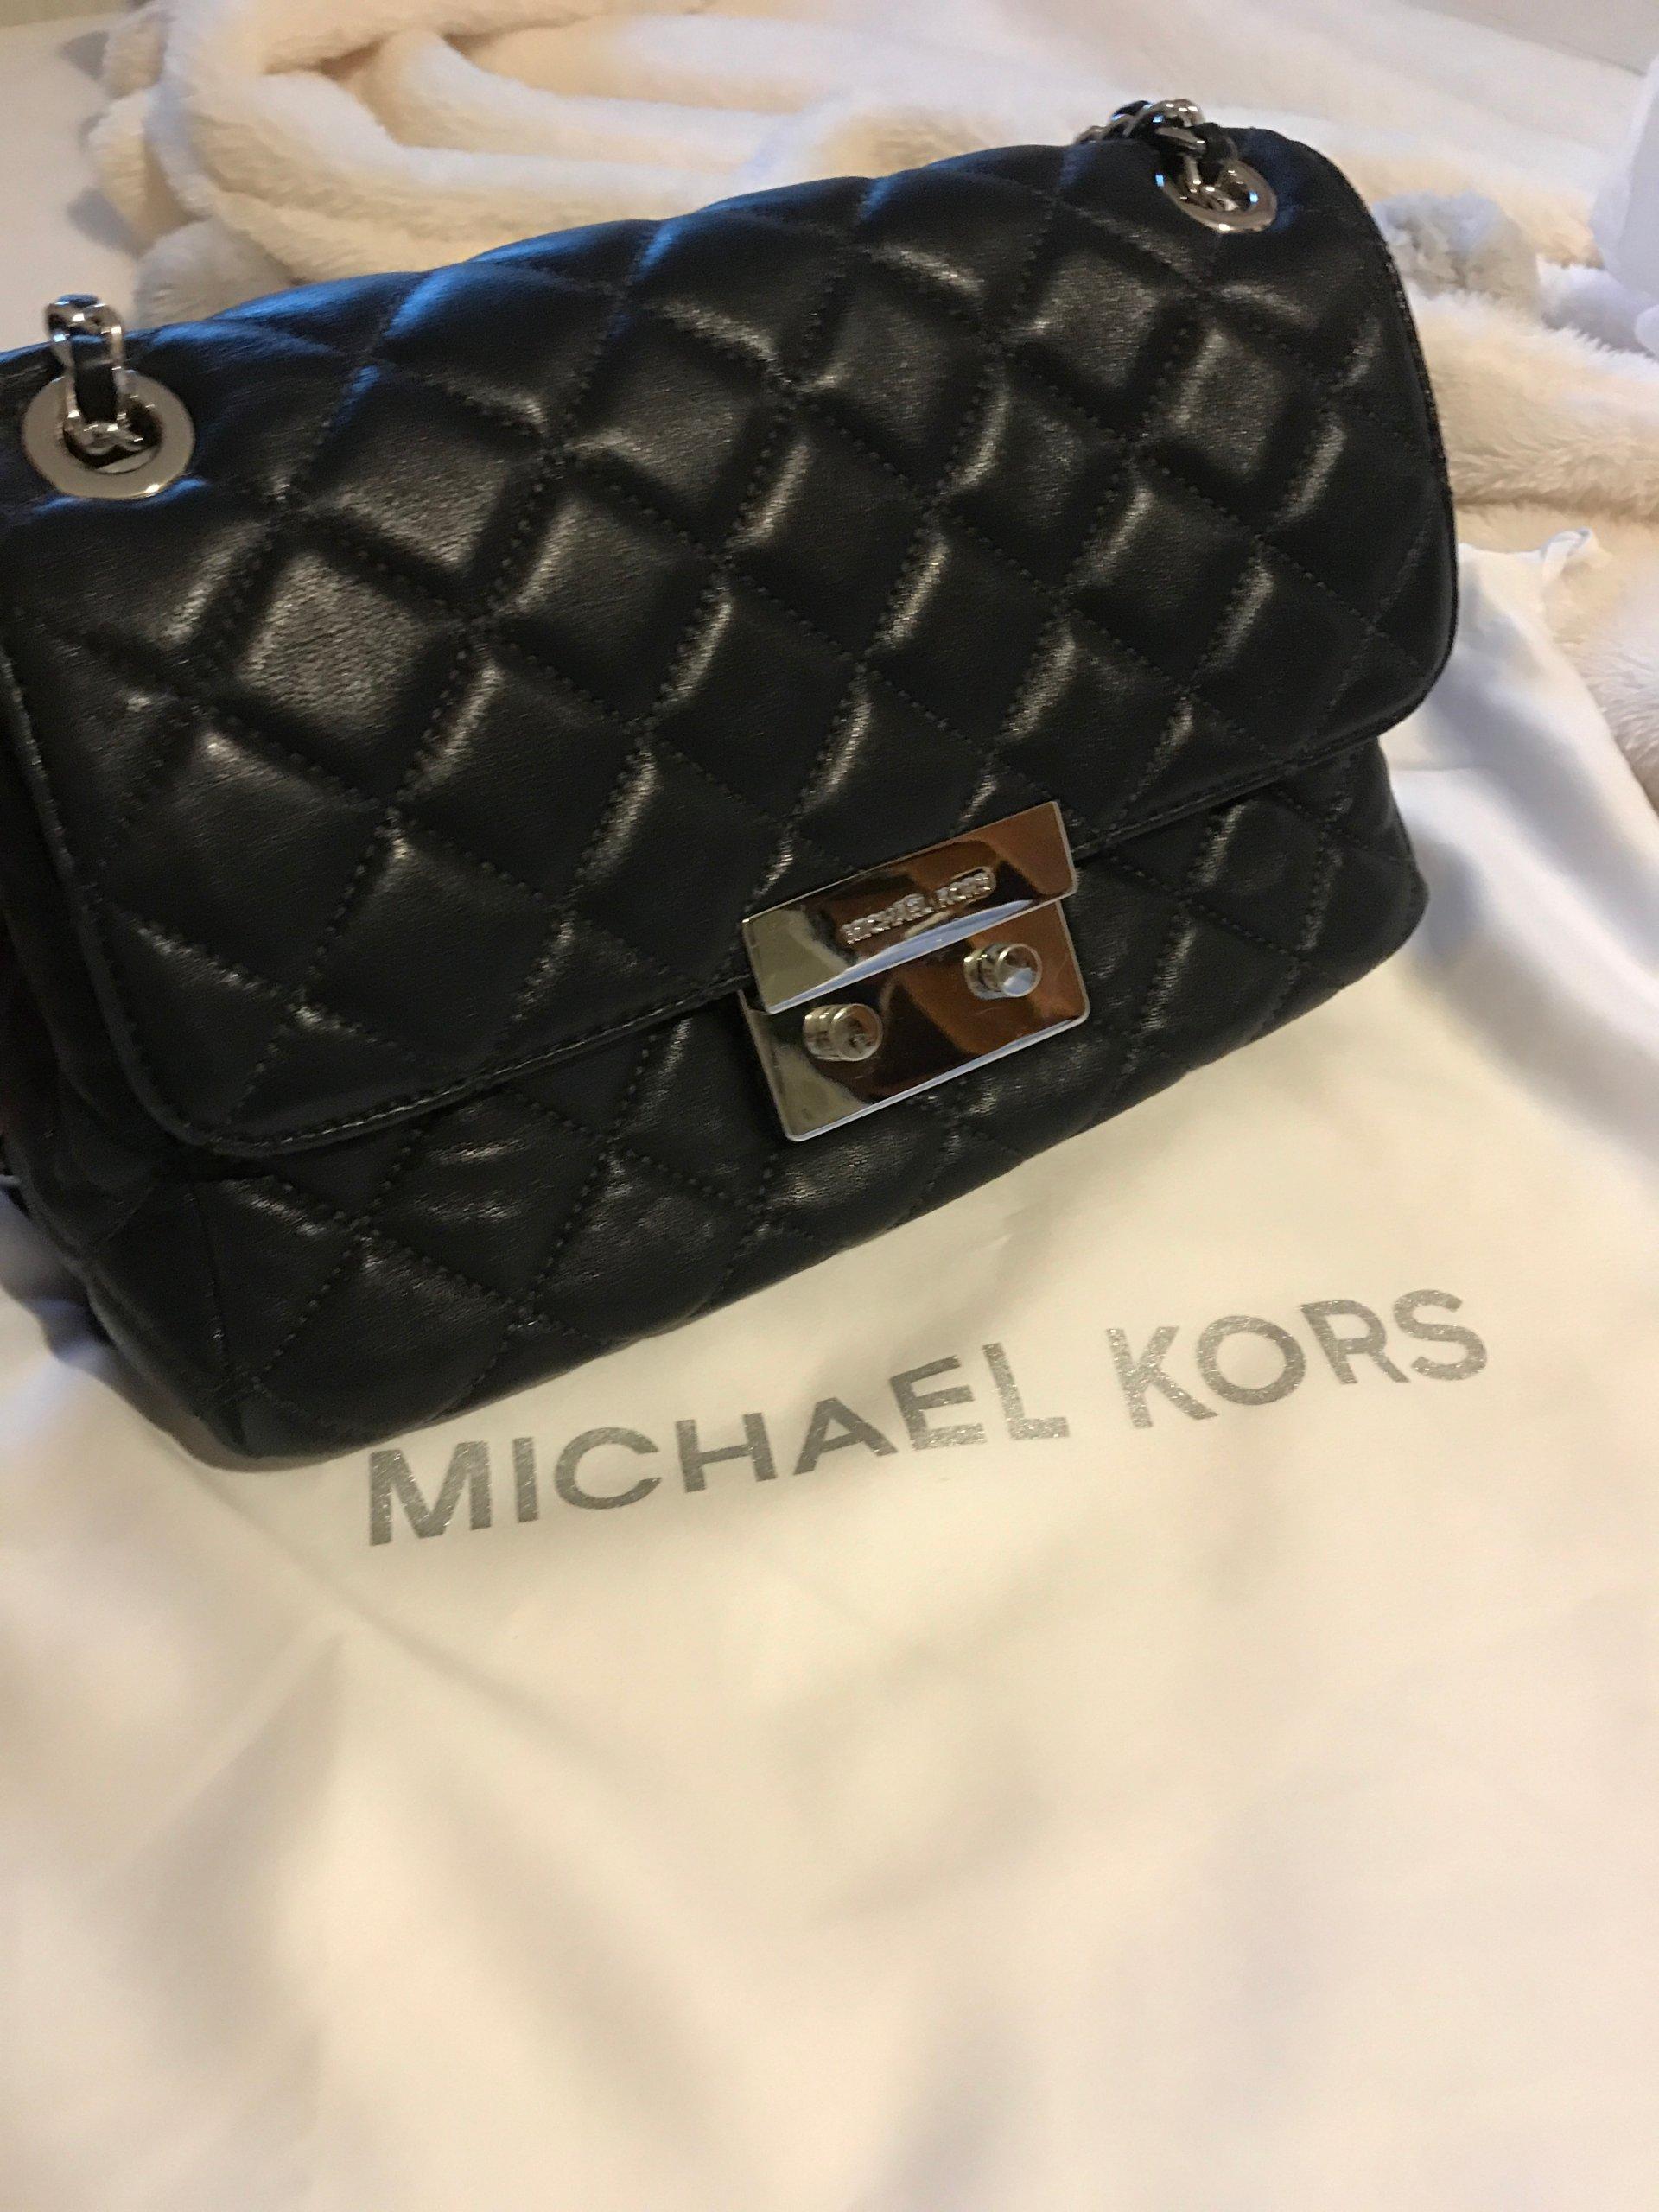 af8c62f373eda MICHAEL KORS MK SLOAN czarna pikowana torebka - 7372942084 ...